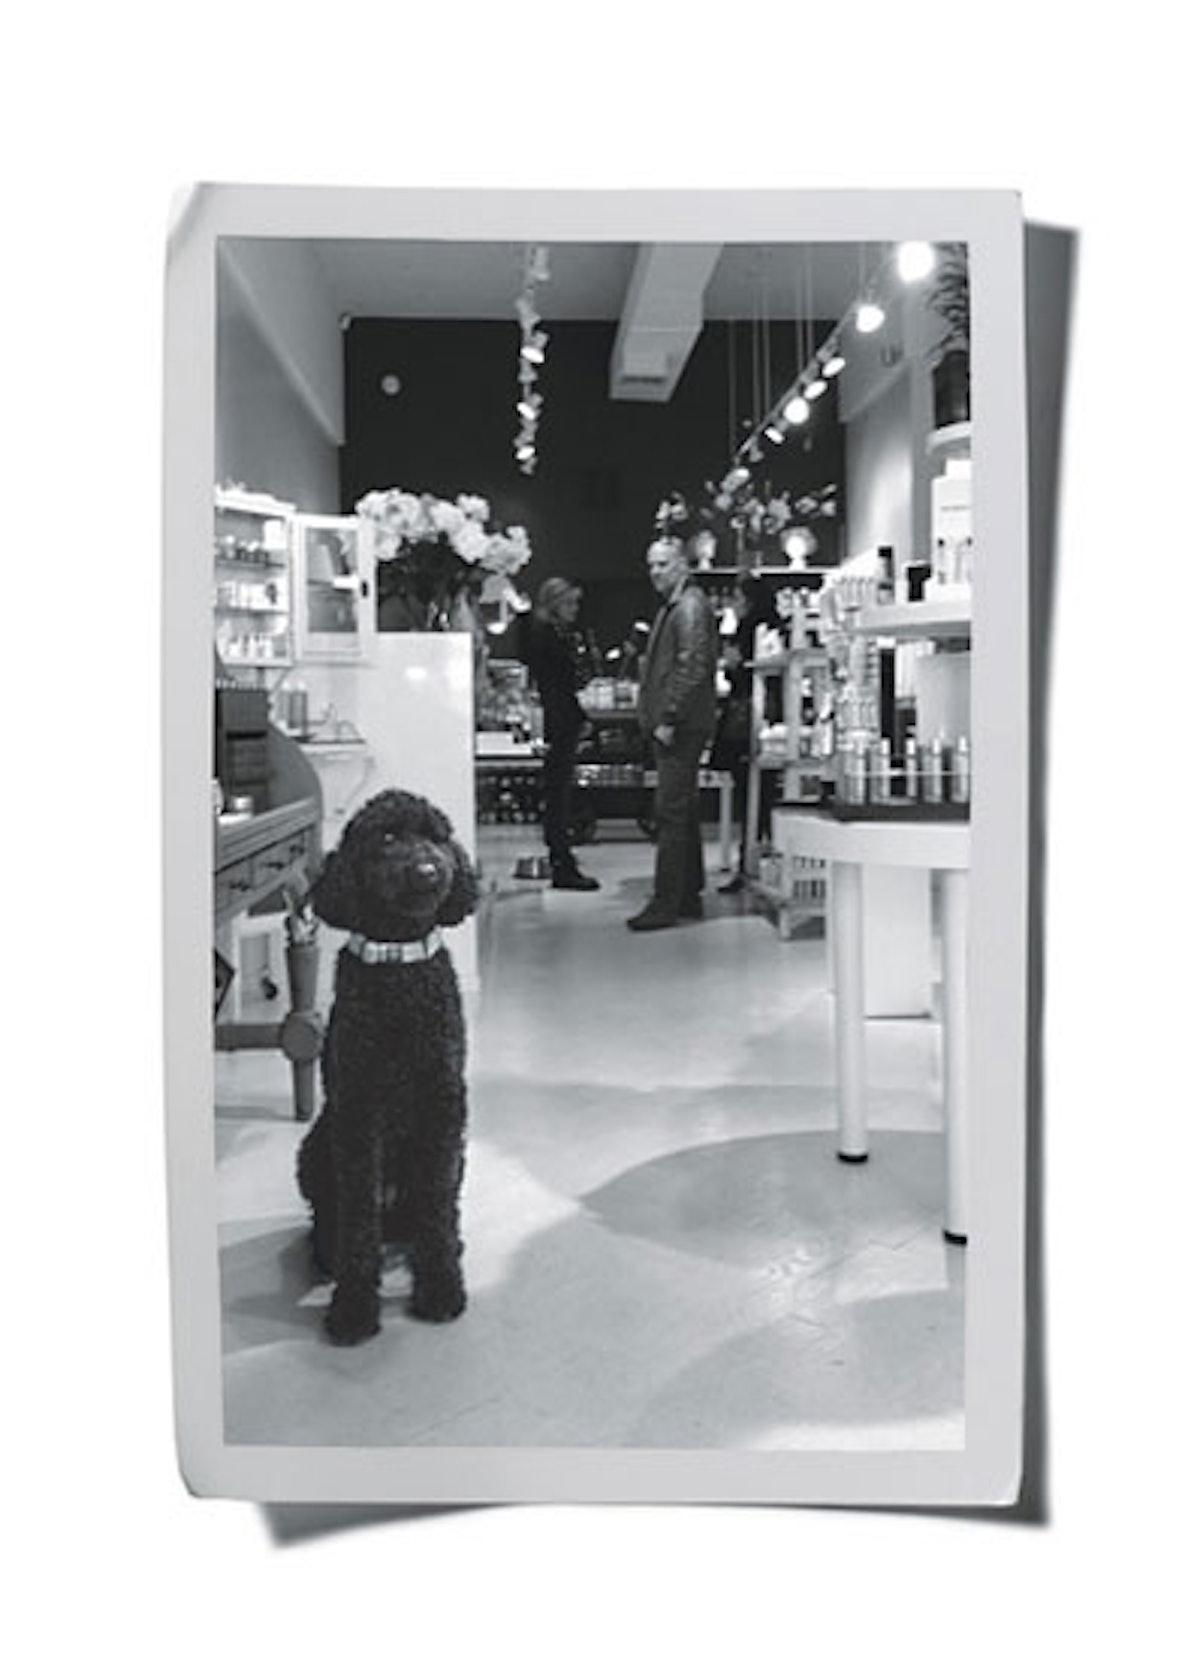 bess-janes-addiction-may-2012-01-v.jpg